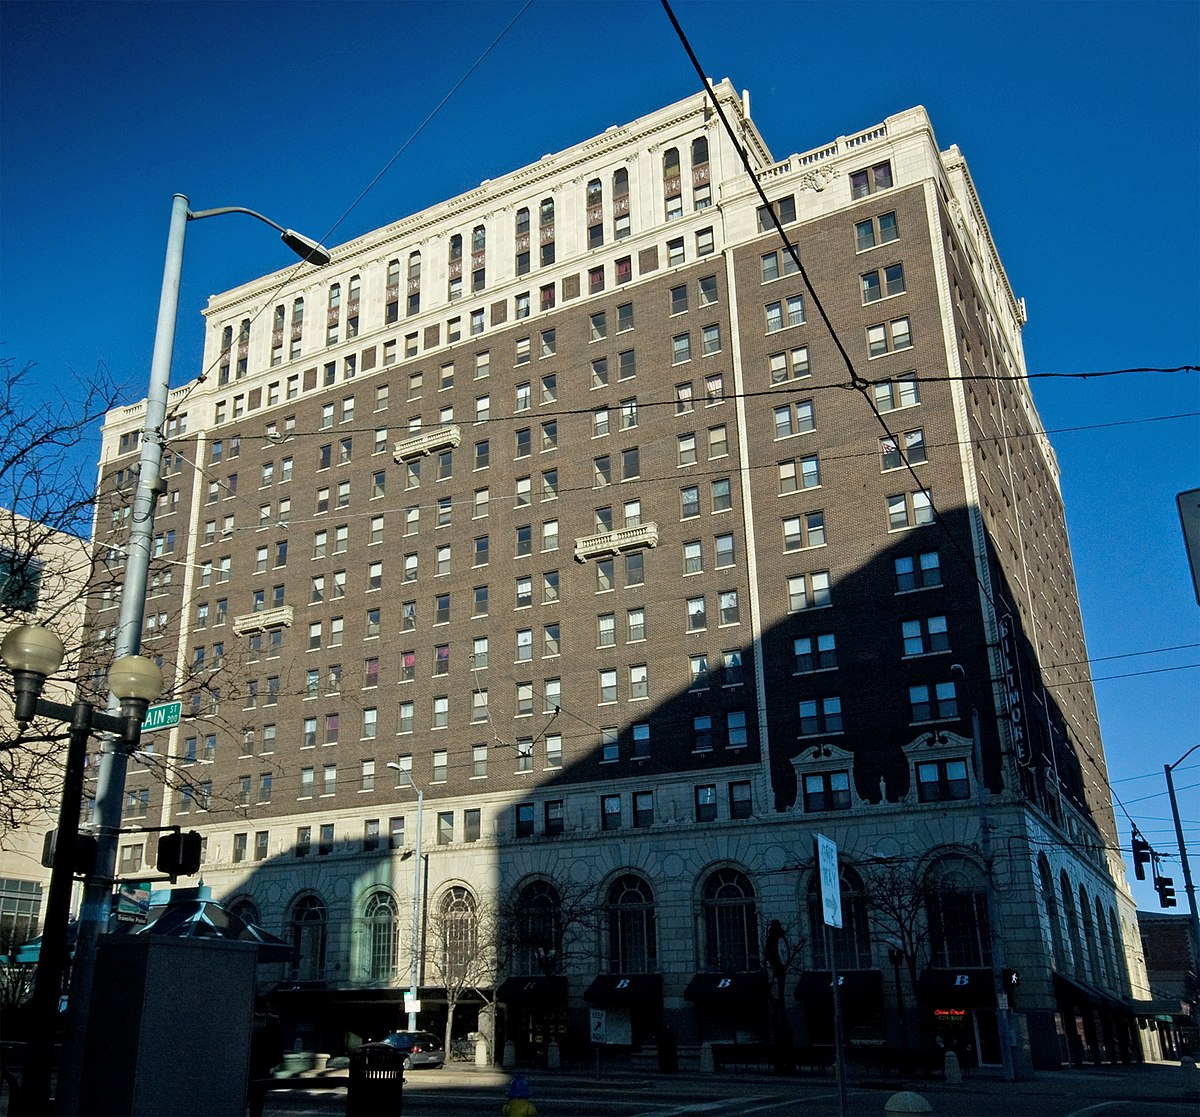 hotel in miamisburg ohio 2018 world 39 s best hotels. Black Bedroom Furniture Sets. Home Design Ideas